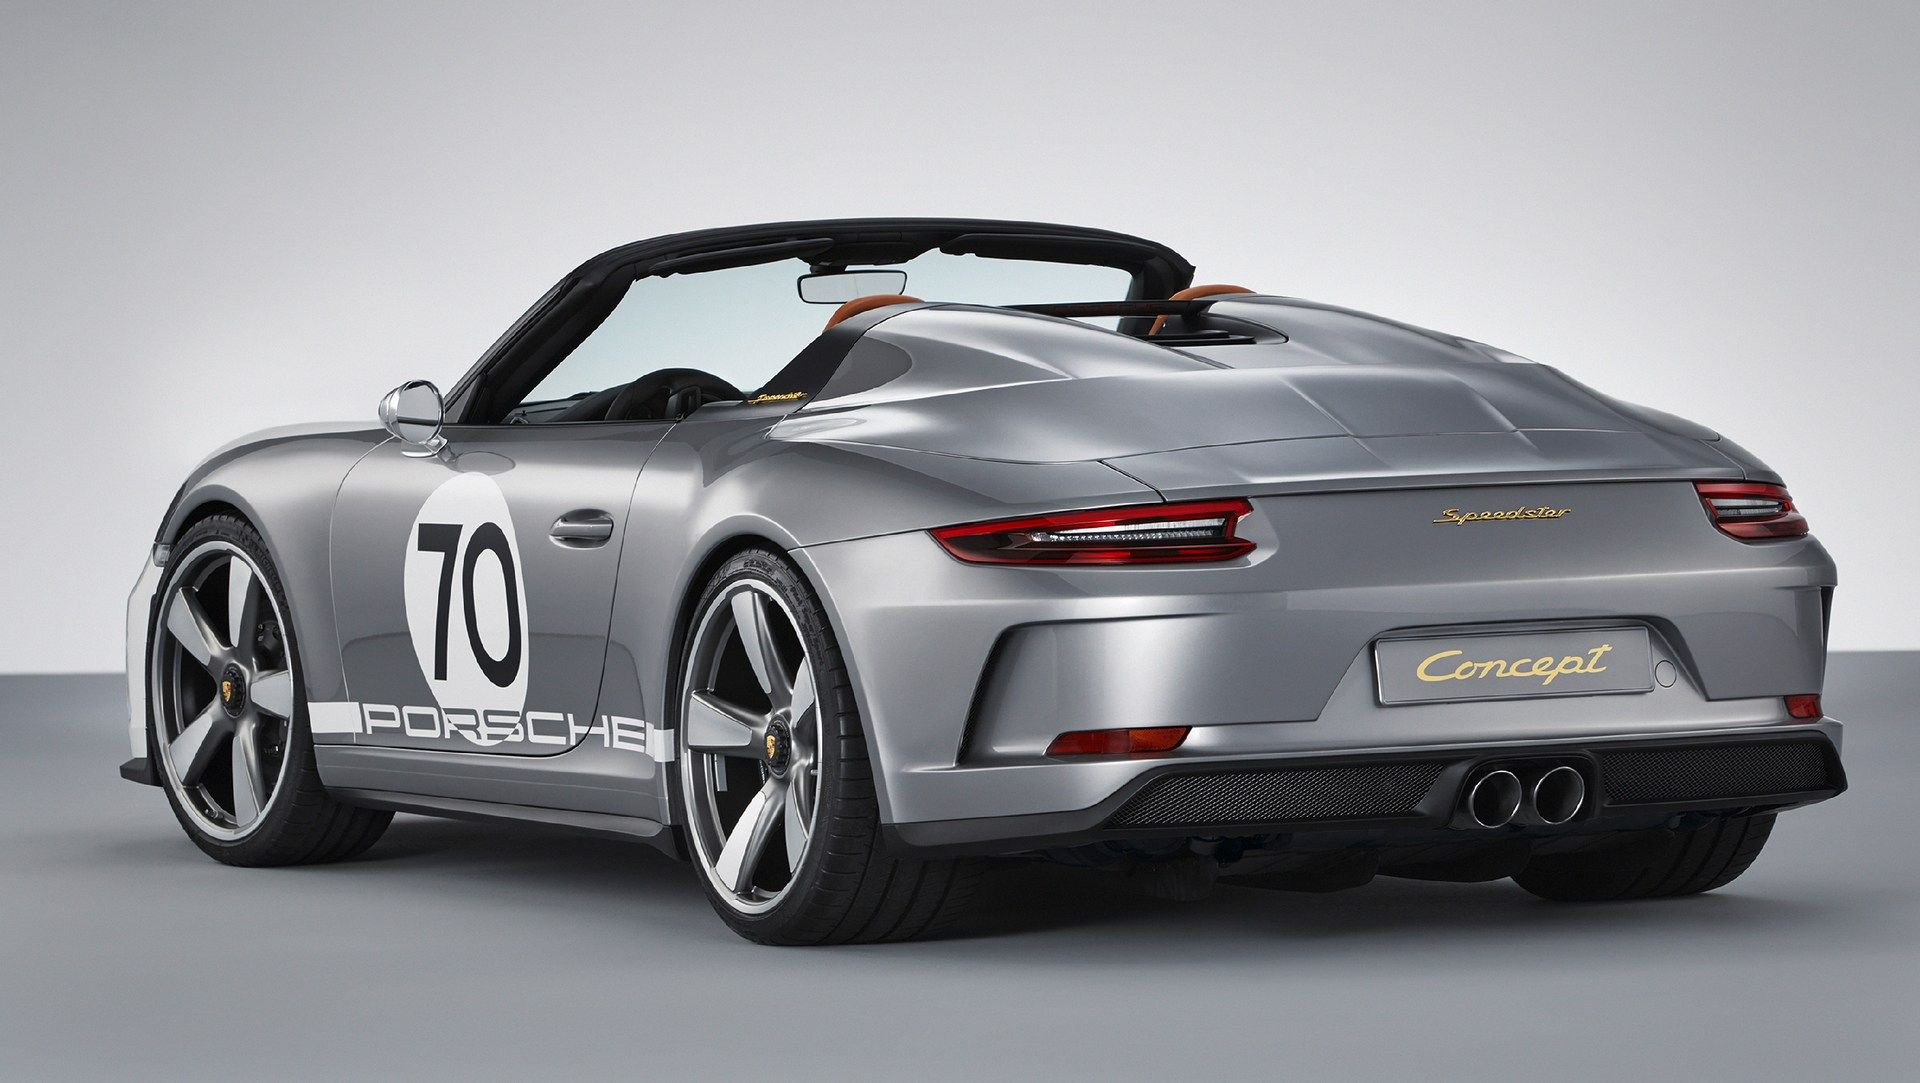 Porsche-911C-Speedster-Concept-3